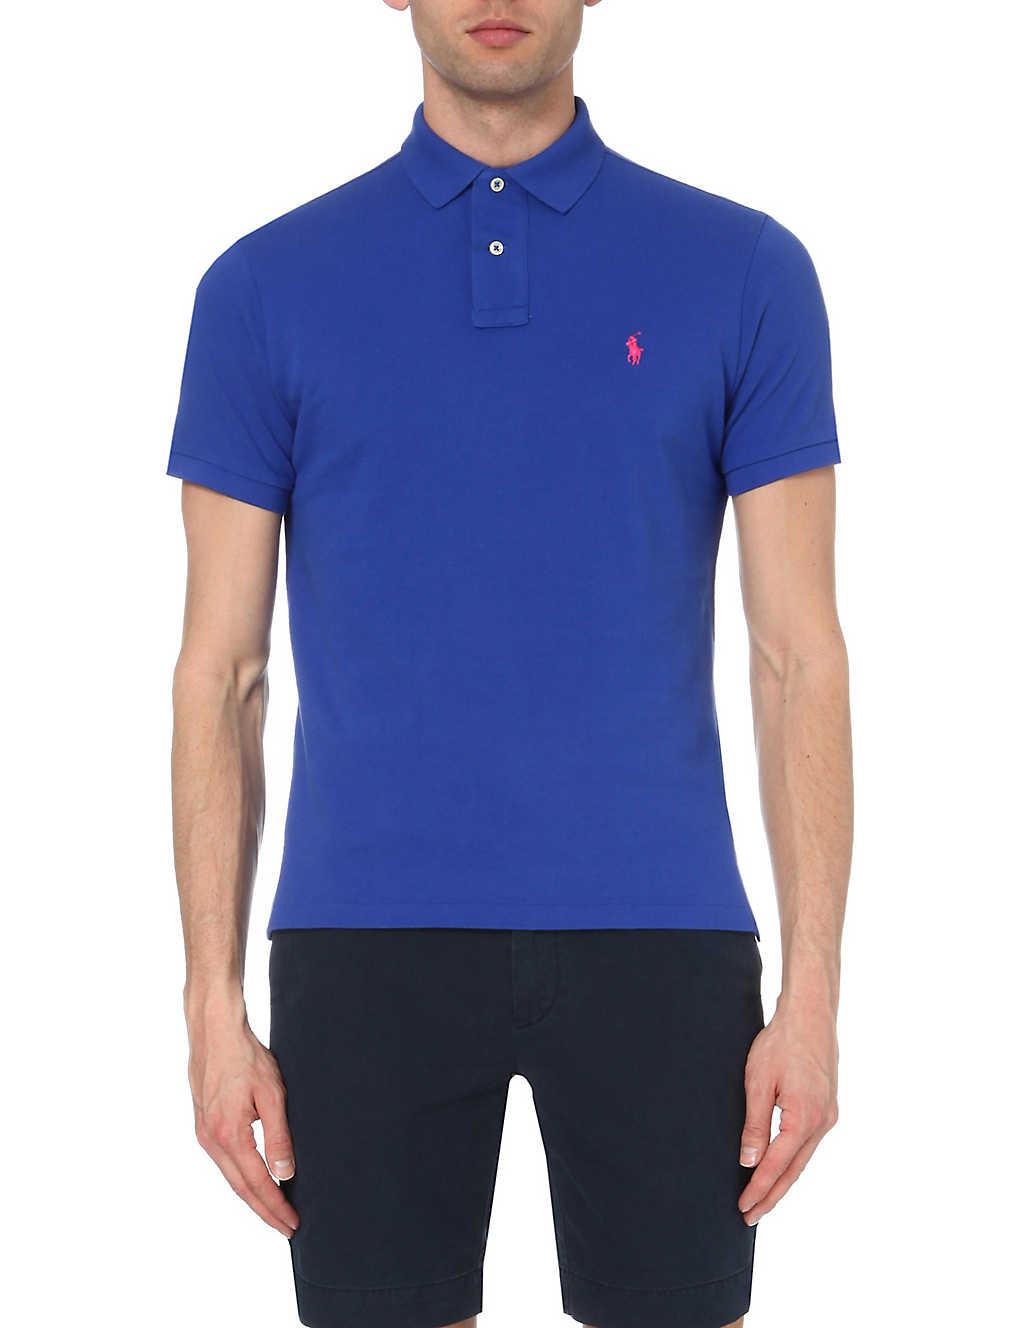 a0538a50 POLO RALPH LAUREN - Custom-fit cotton-mesh polo shirt   Selfridges.com